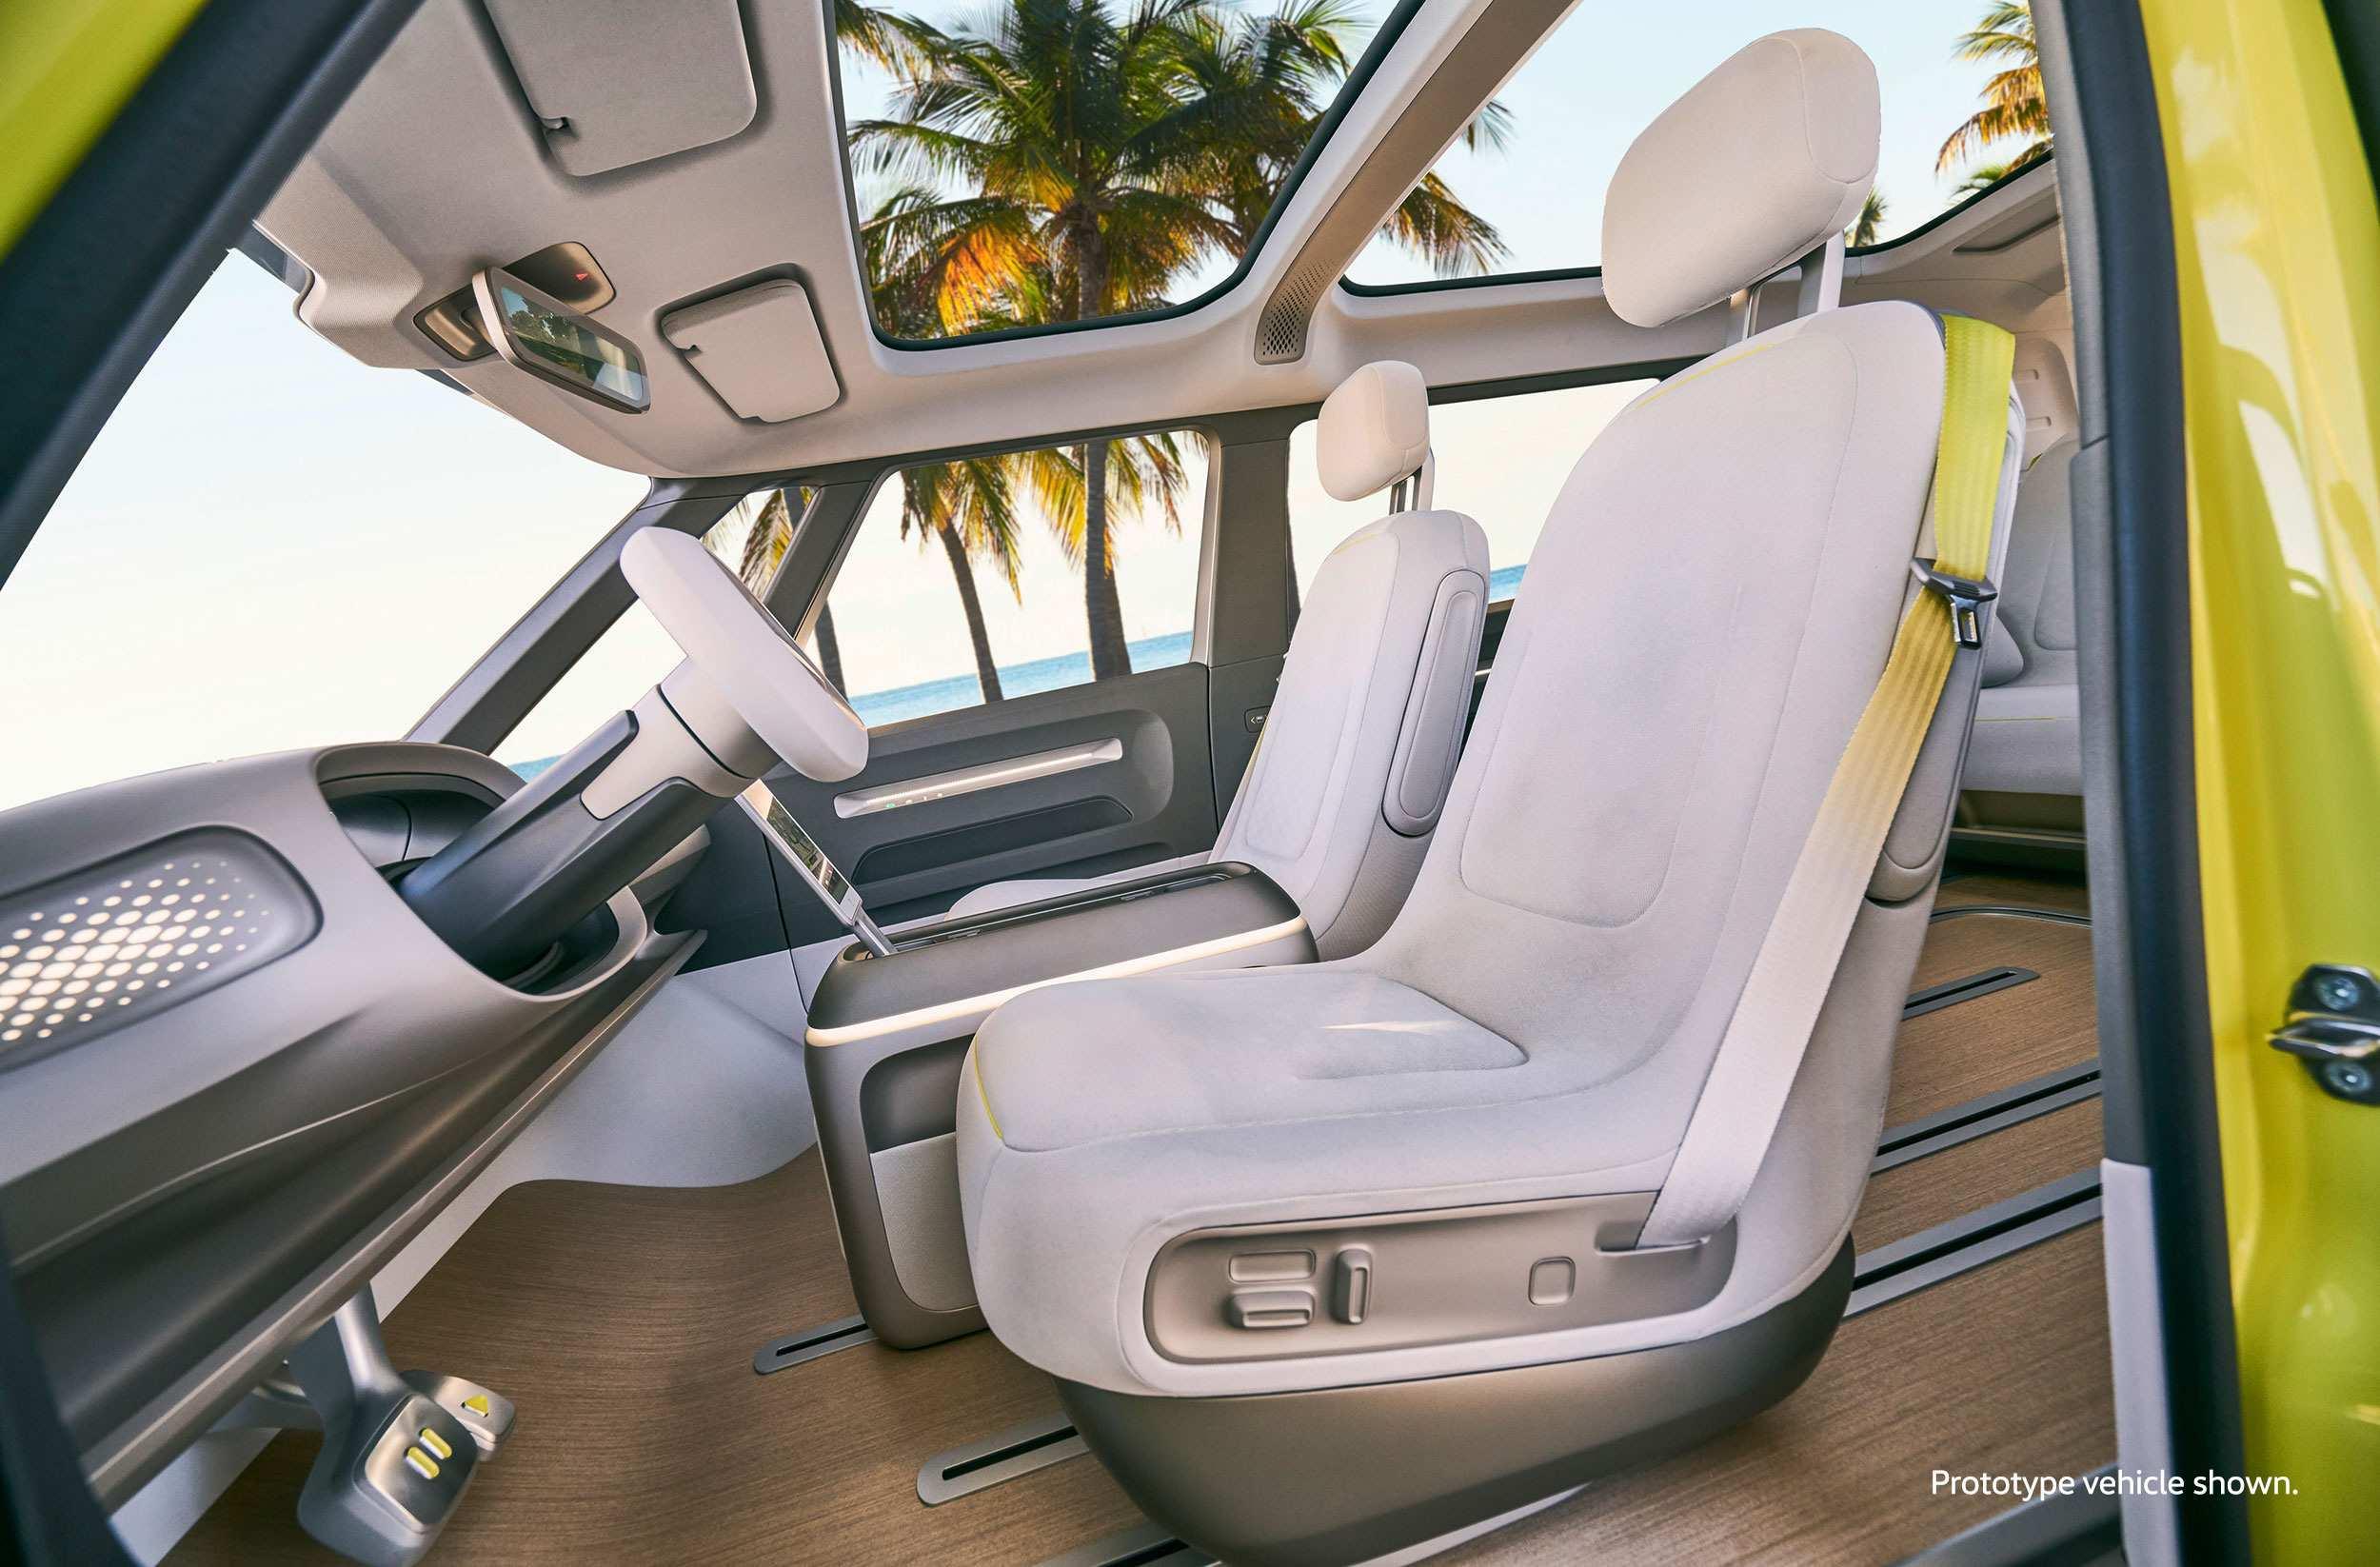 28 All New 2020 Vw Minibus Price for 2020 Vw Minibus